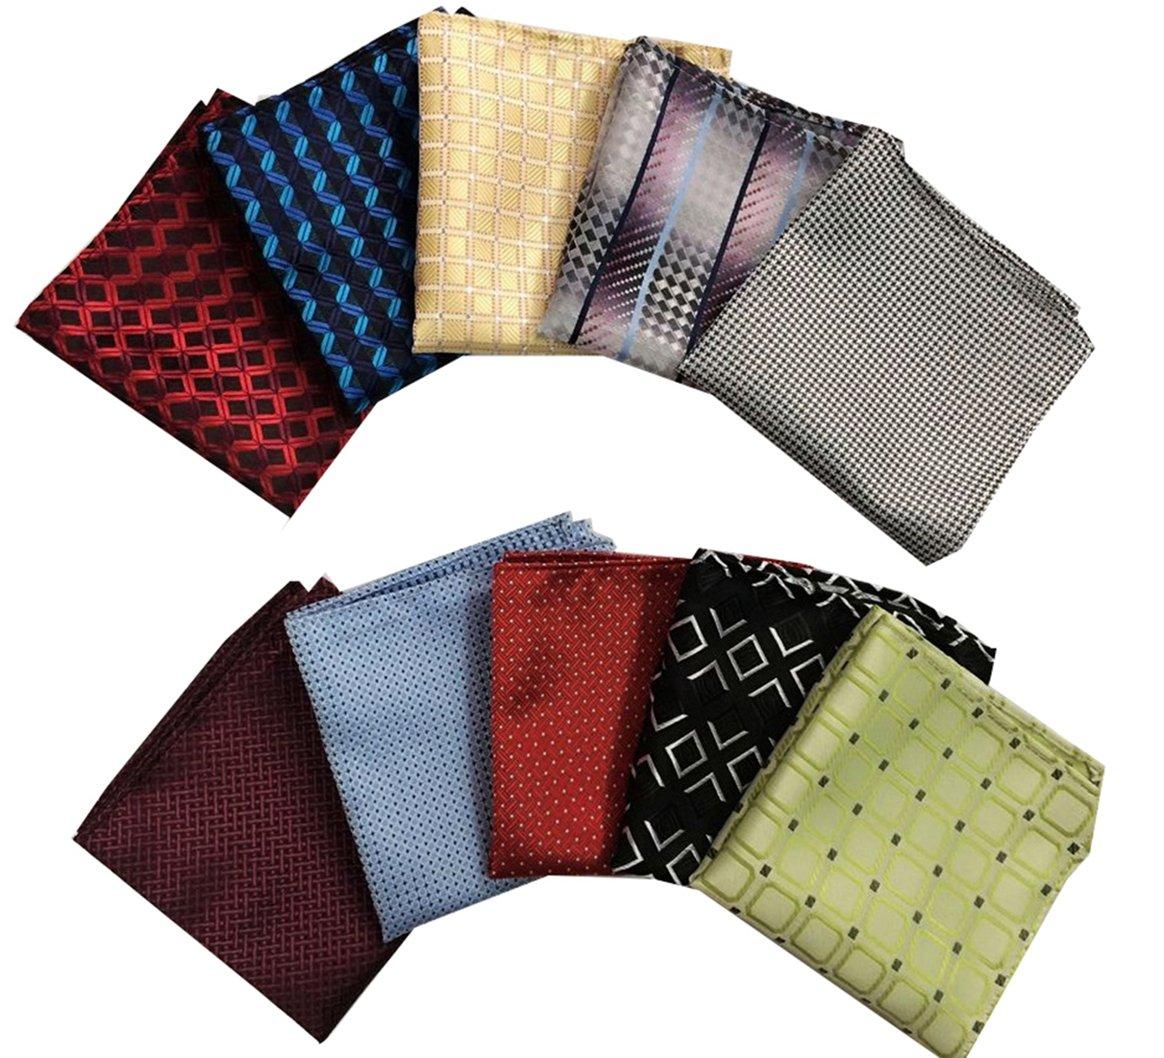 MENDENG Men's 10 Pack Plaid Check Assorted Pocket Square Silk Handkerchief Set by MENDENG (Image #2)